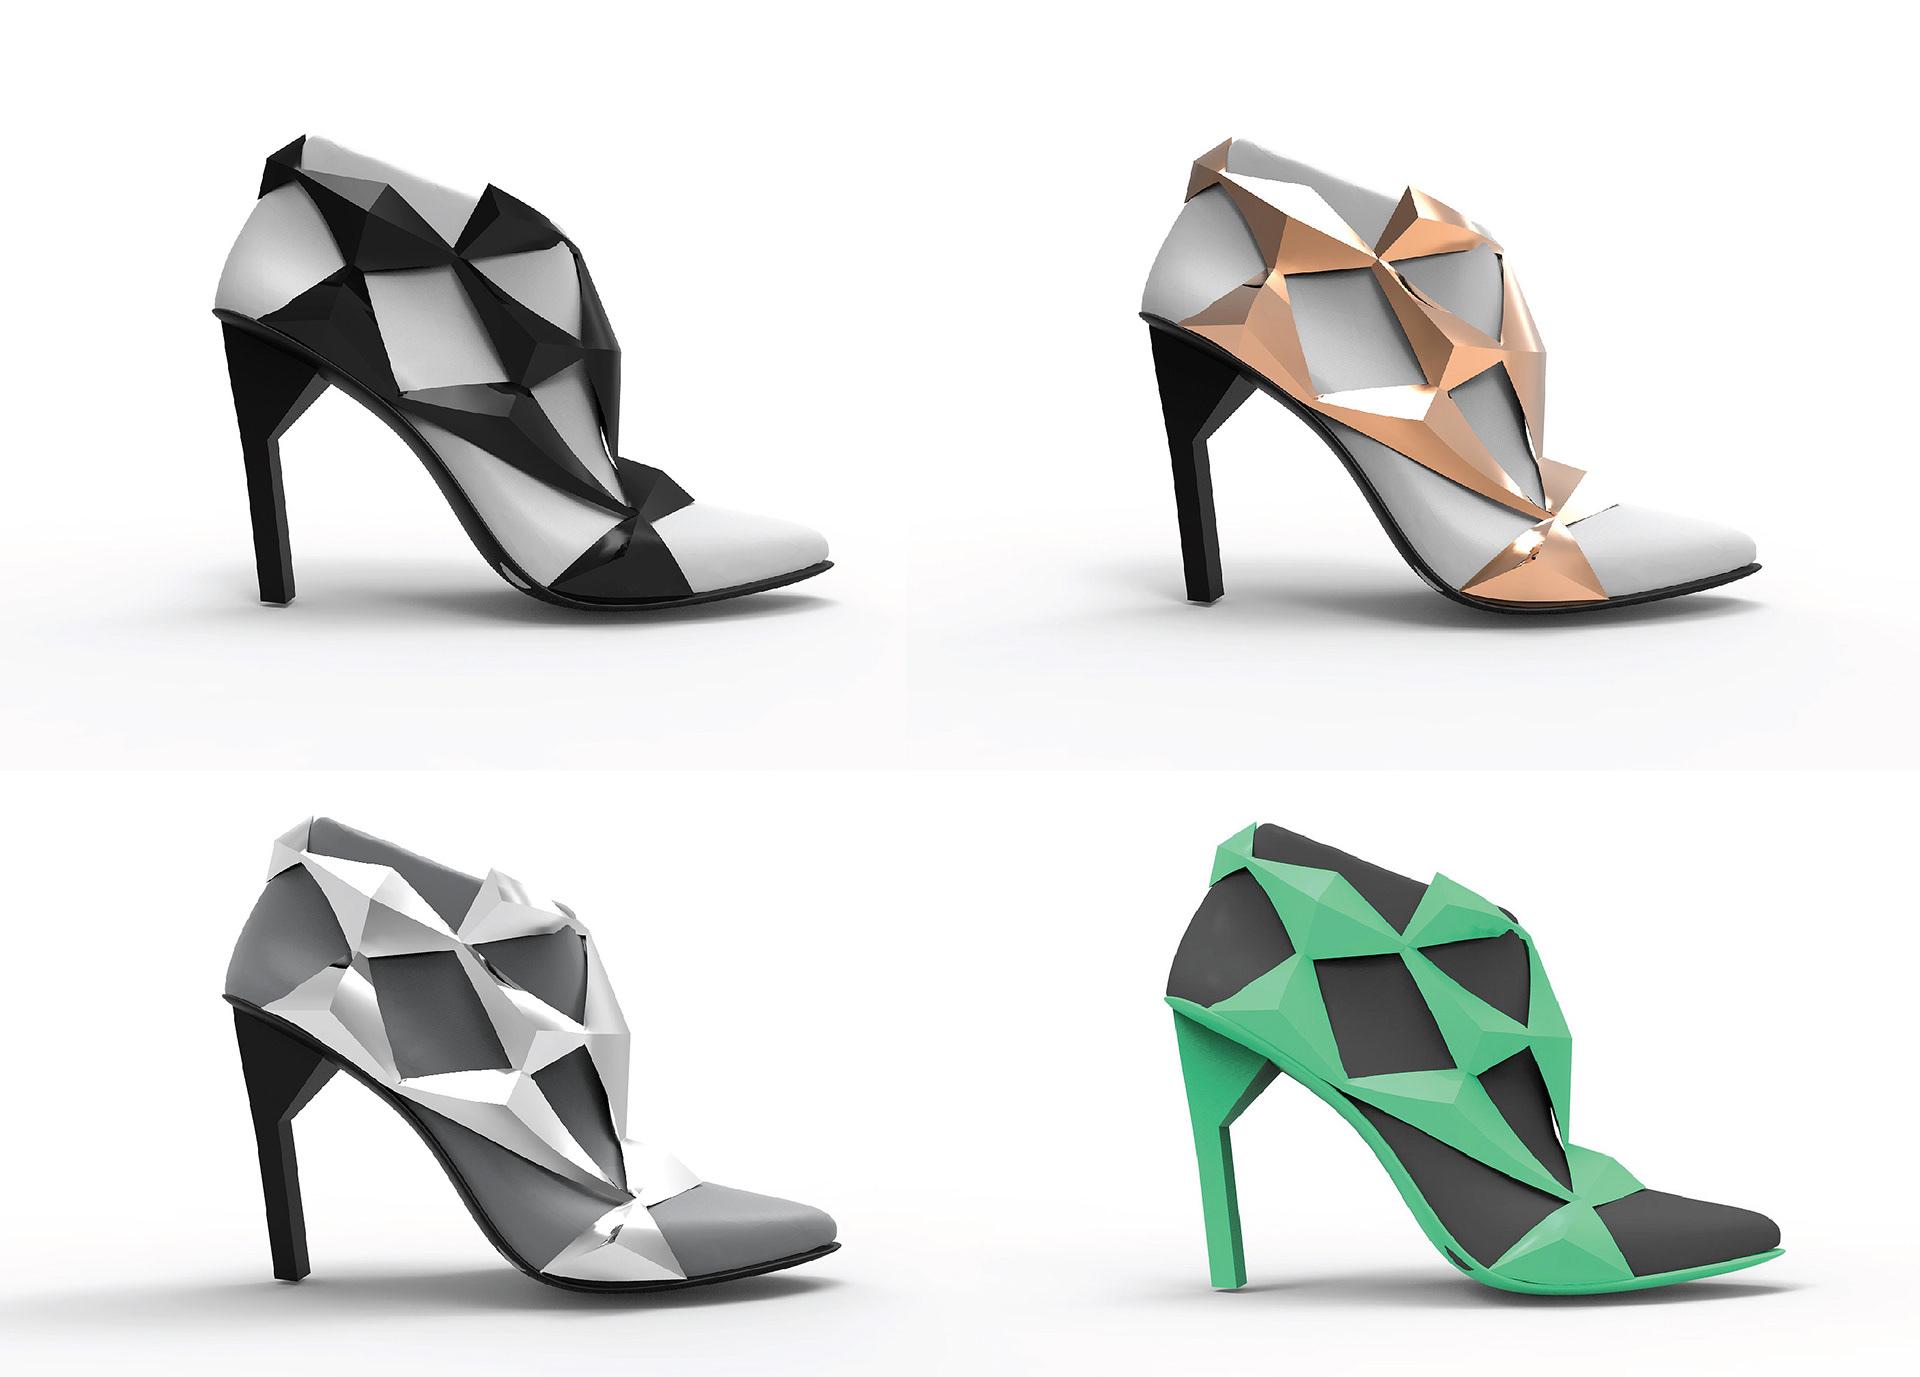 michal kukucka - United Nude / 3D printed shoe development